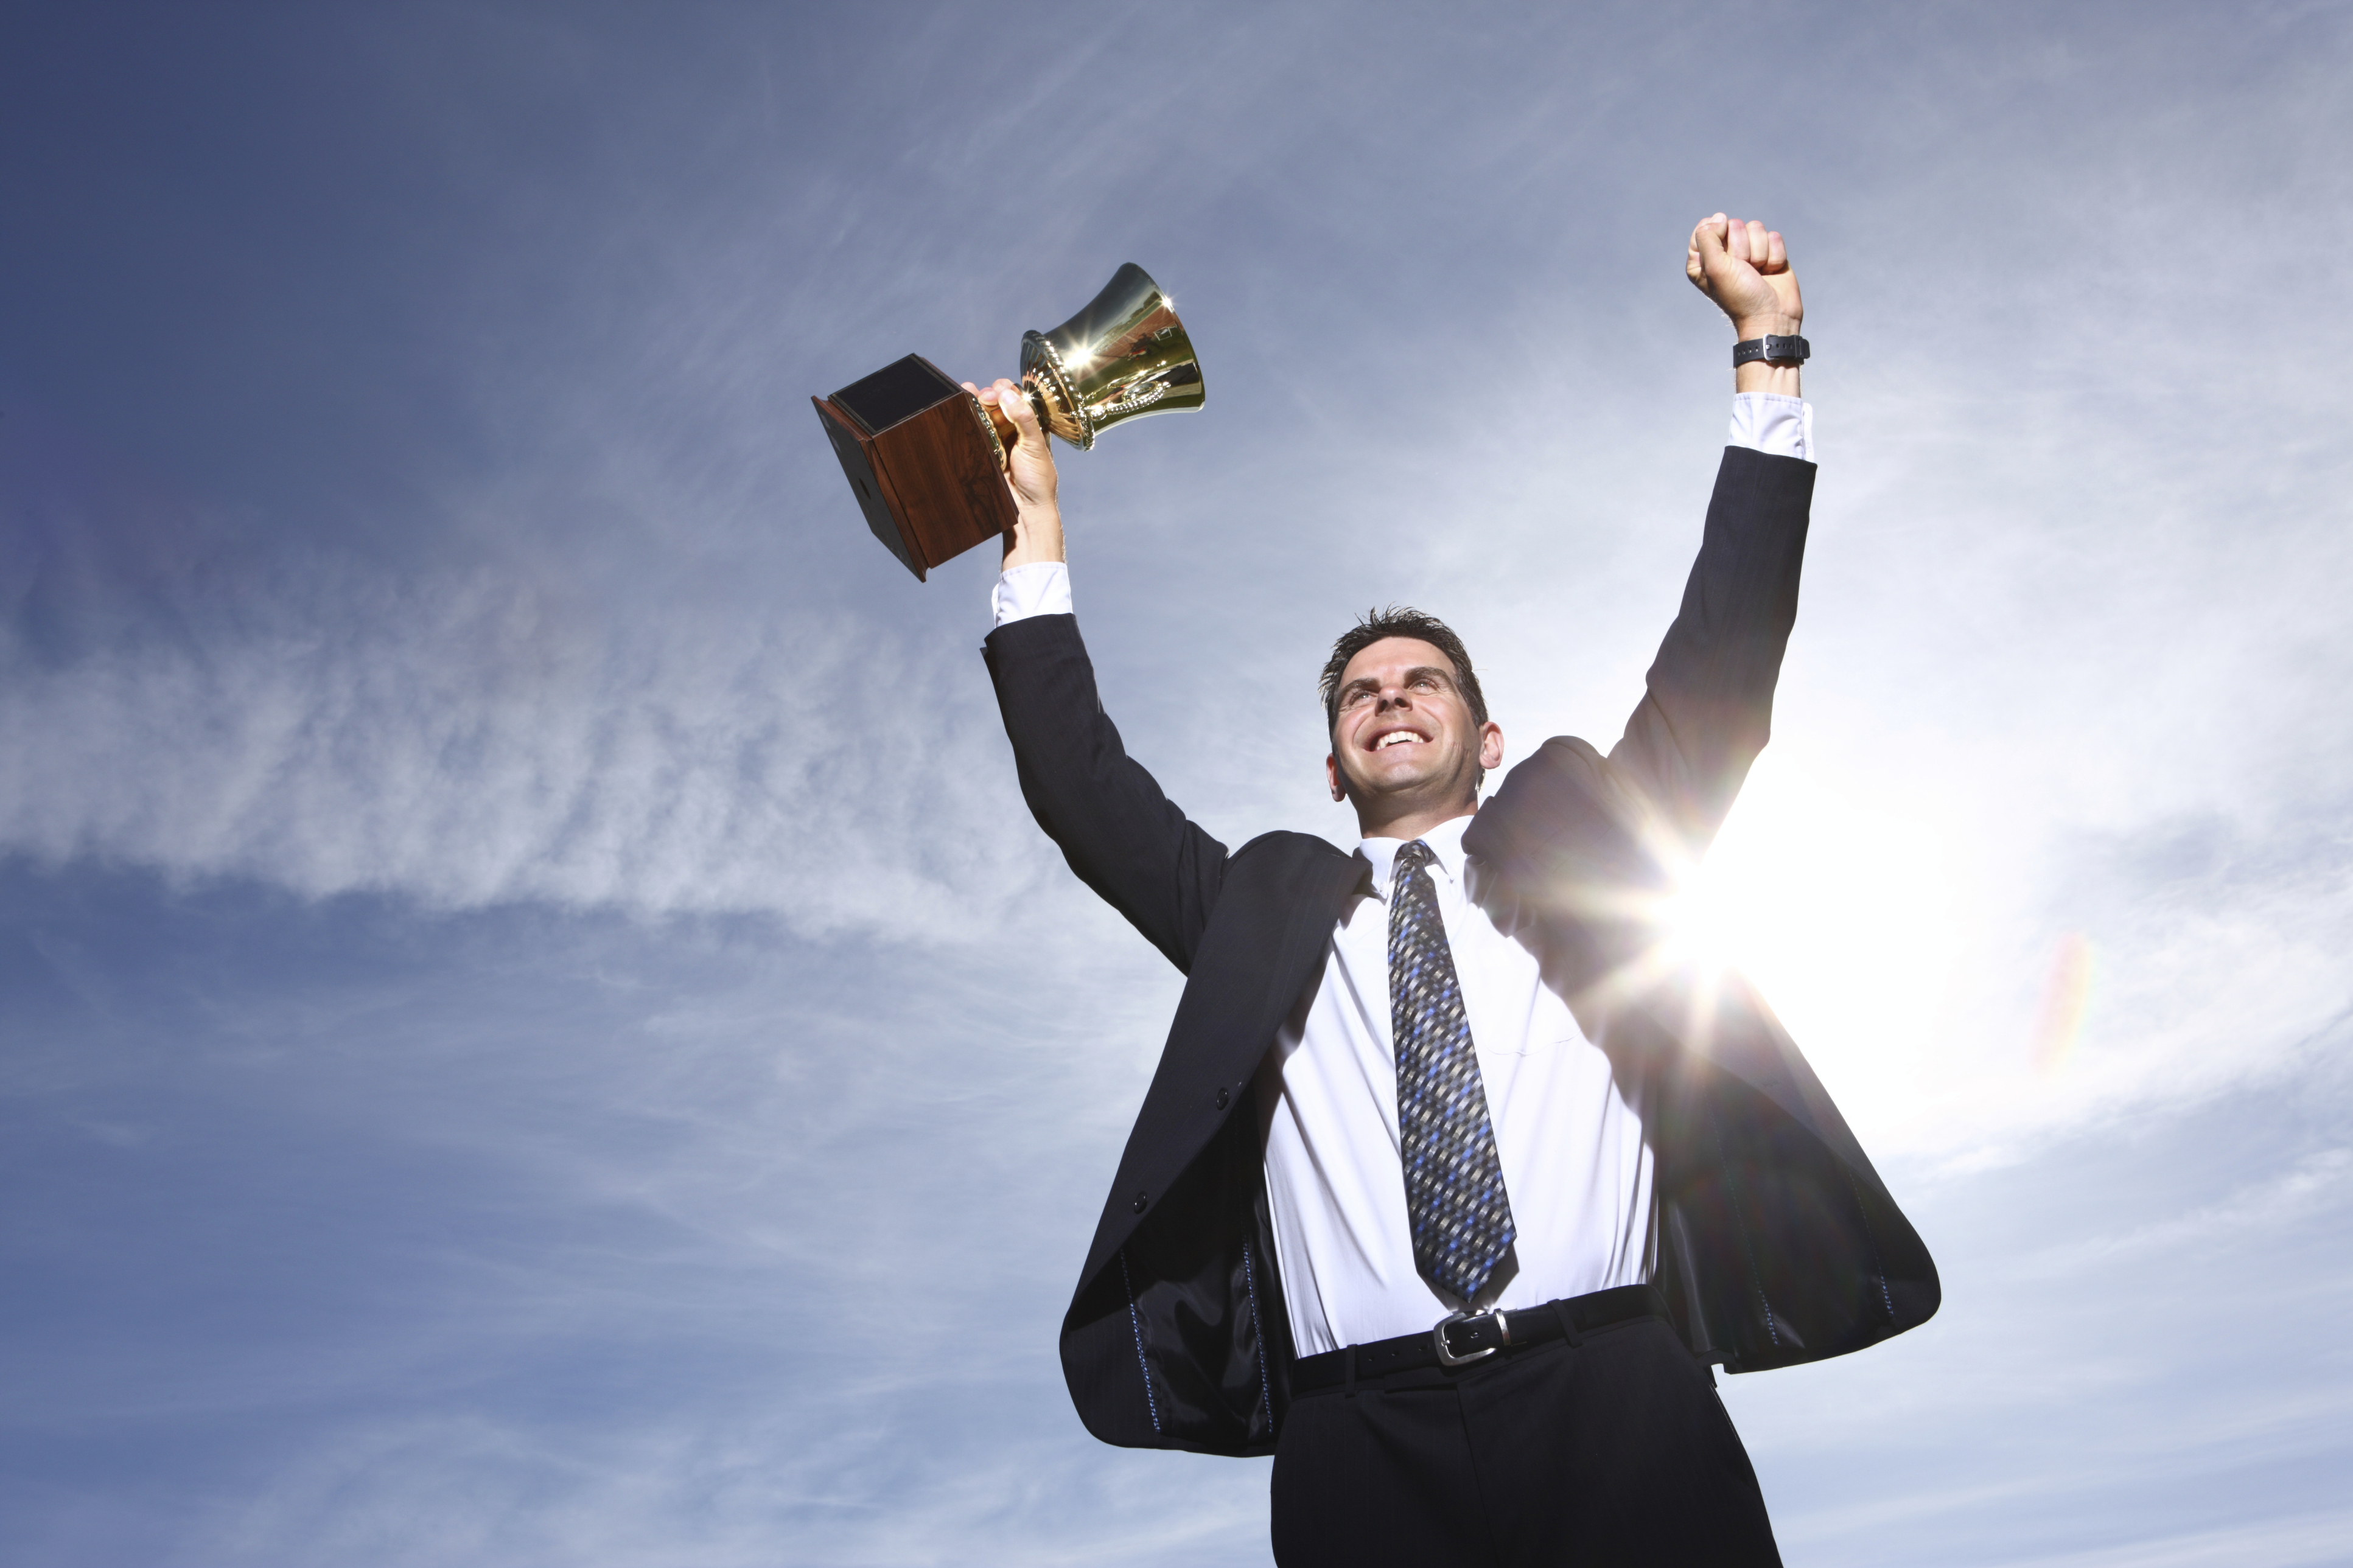 yoyo blog success image 1